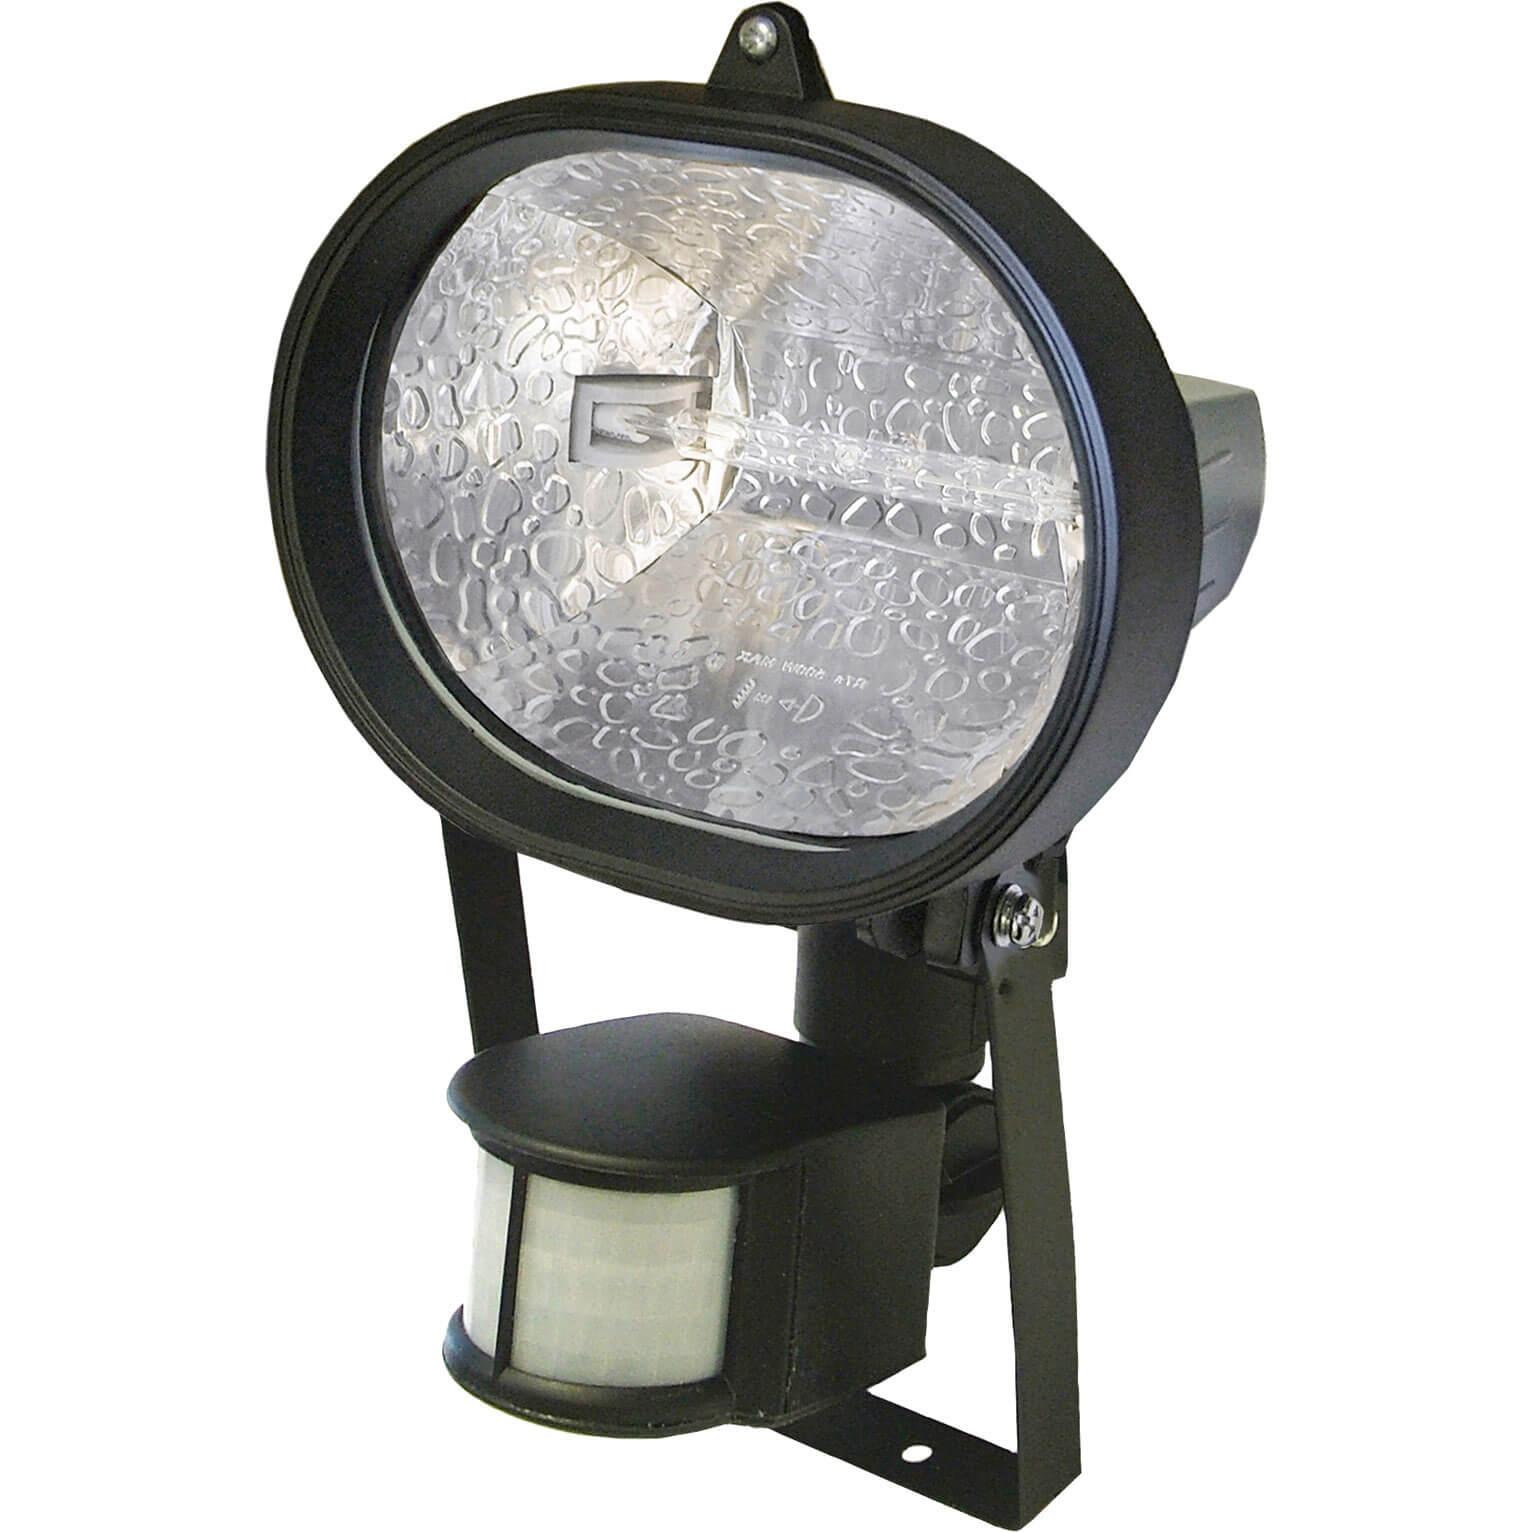 Faithfull Portable PIR Security Light 150w 240v